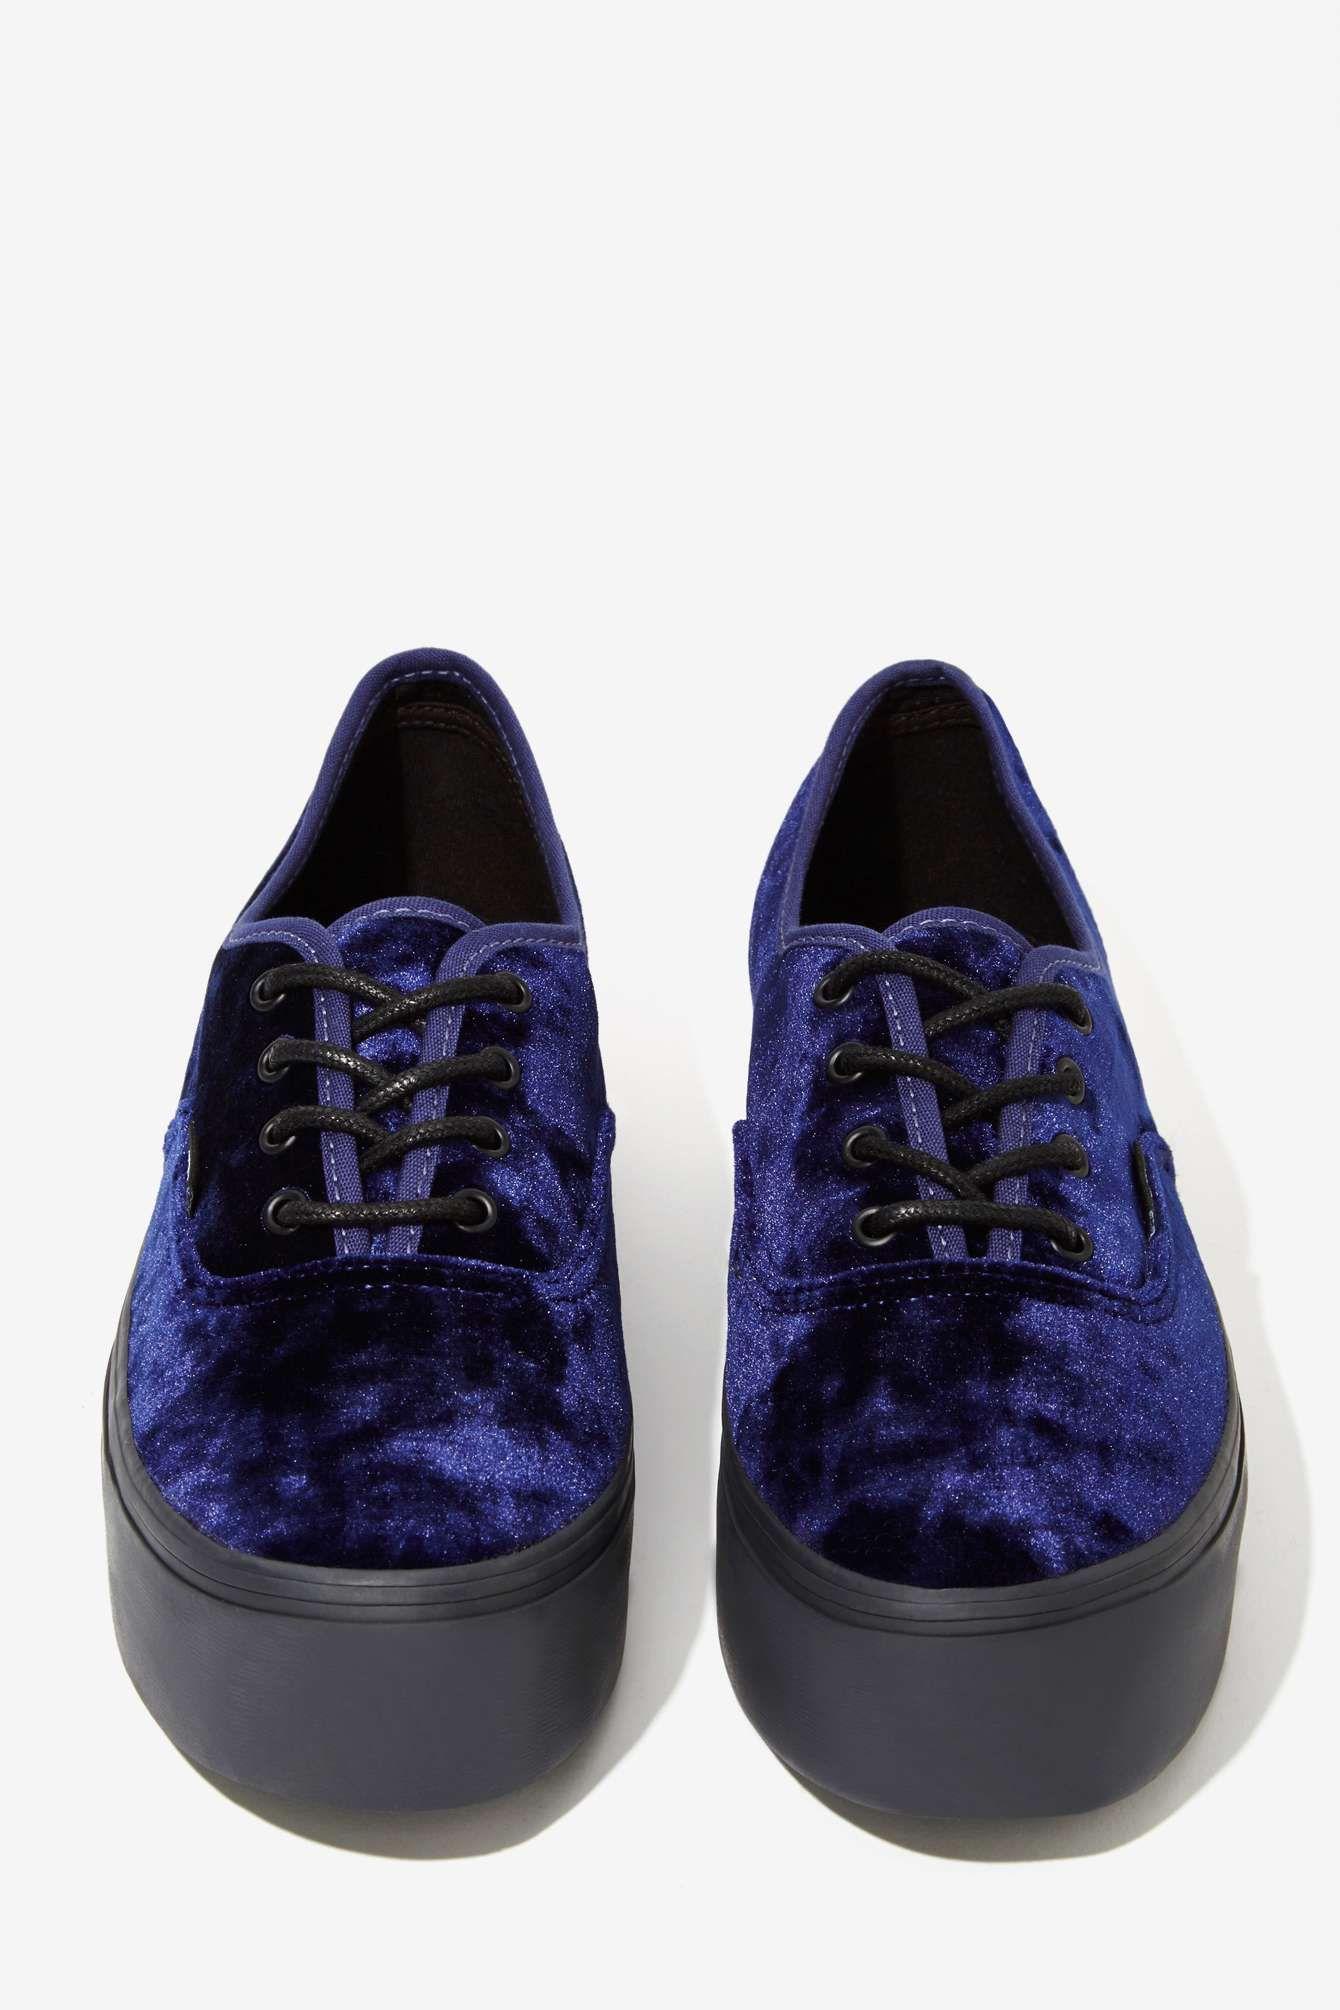 0f2ede495d0 Vans Authentic Platform Sneaker - Blue Velvet